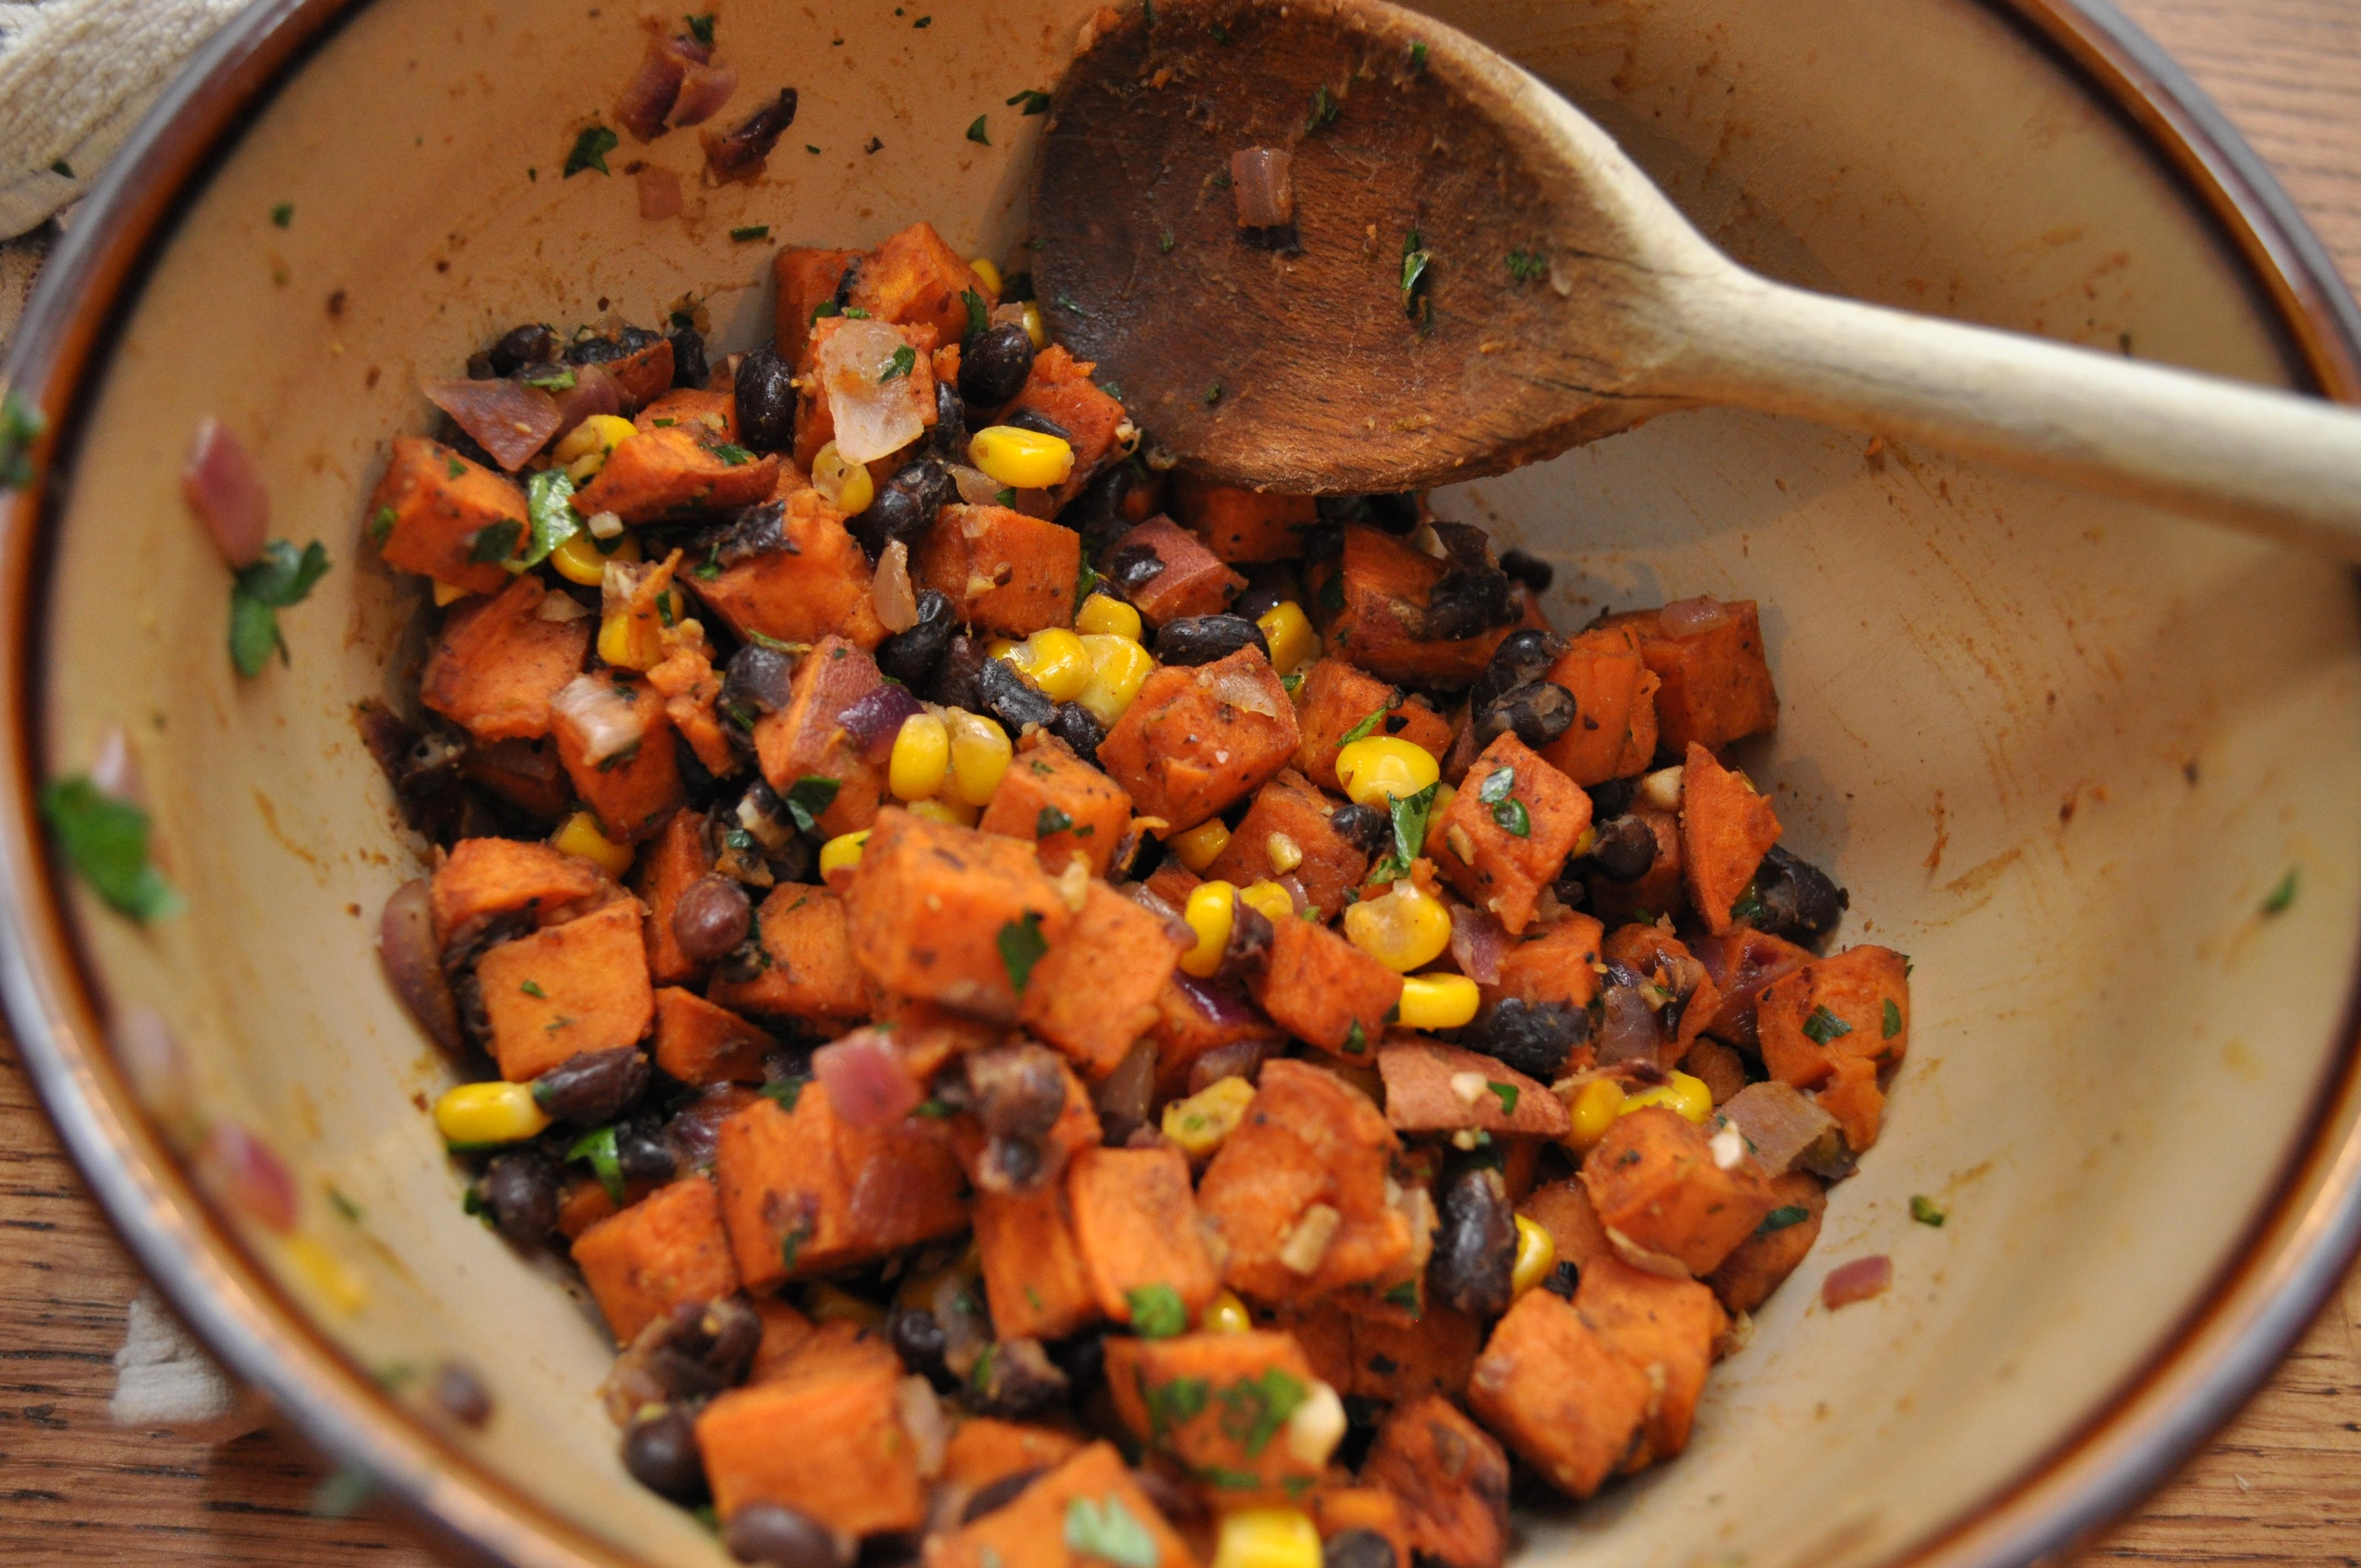 Sweet Potato, Black Bean and Corn Taco FIlling